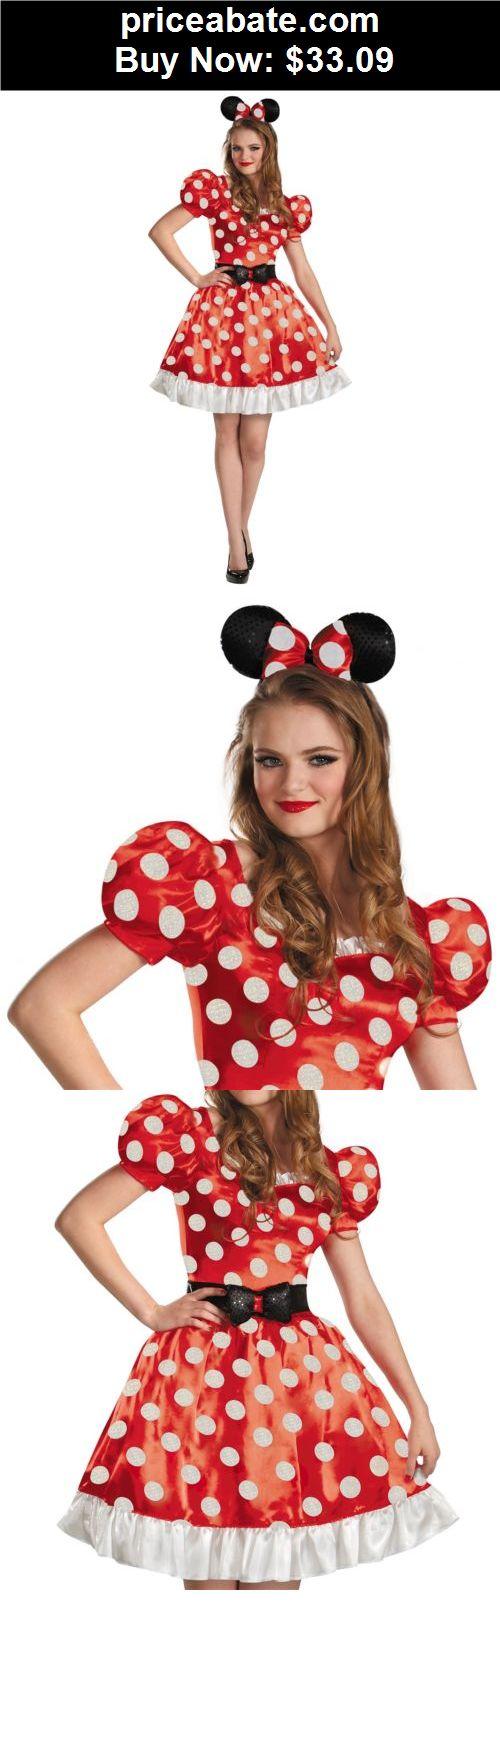 adab73cf87e2c Women-Costumes Minnie Mouse Costume Adult Disney Halloween Fancy Dress -  BUY IT NOW Sc 1 St Pinterest